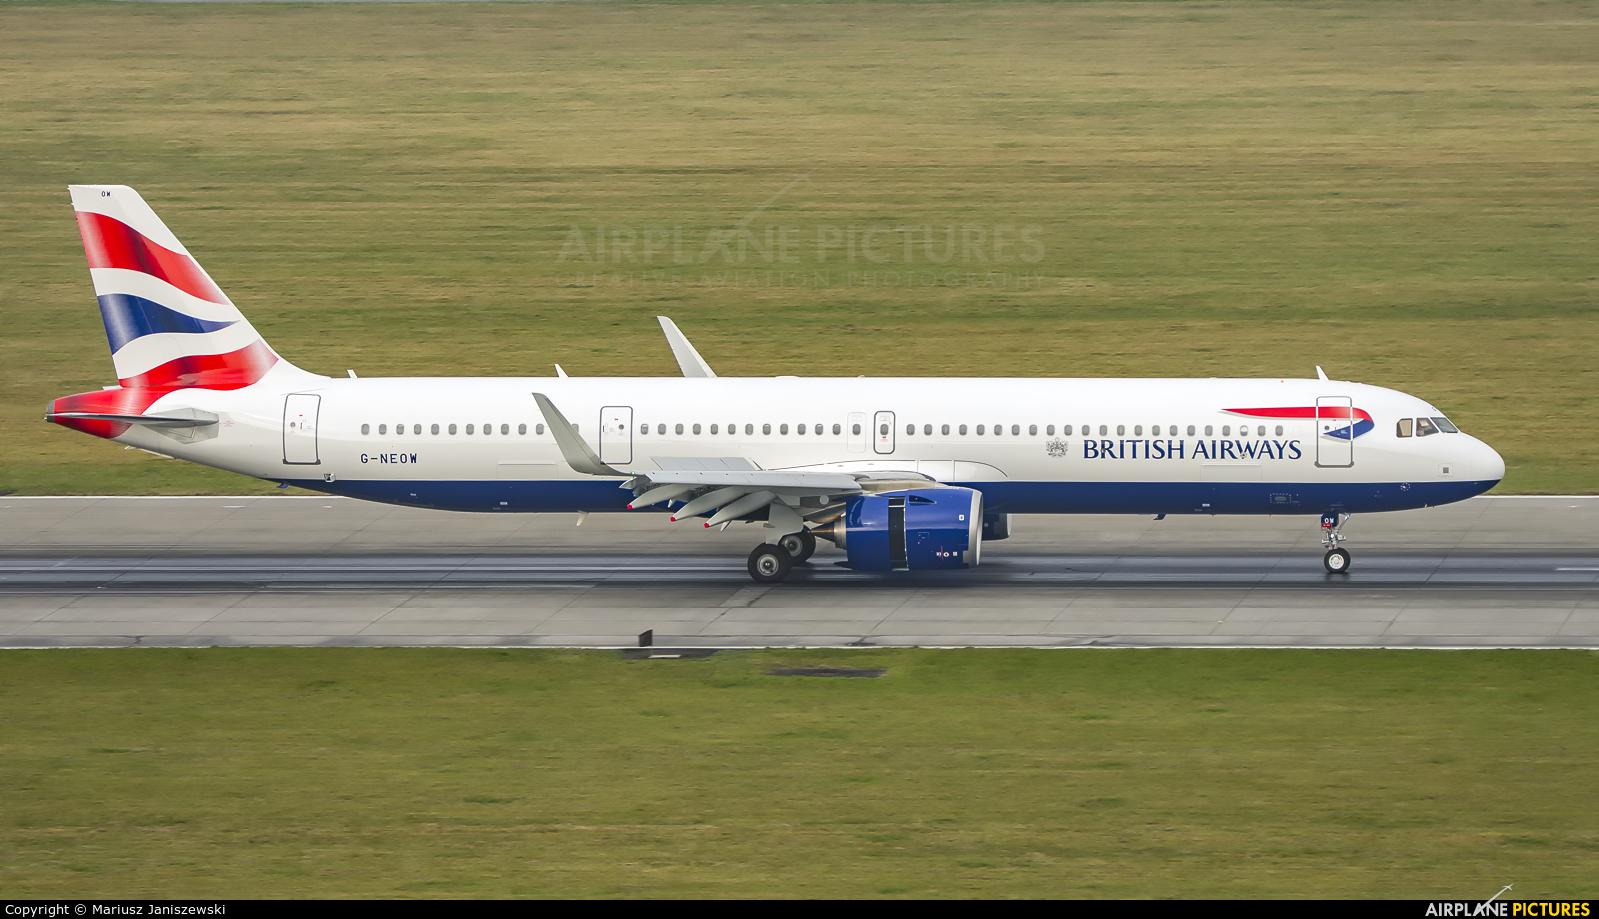 British Airways G-NEOW aircraft at Kraków - John Paul II Intl